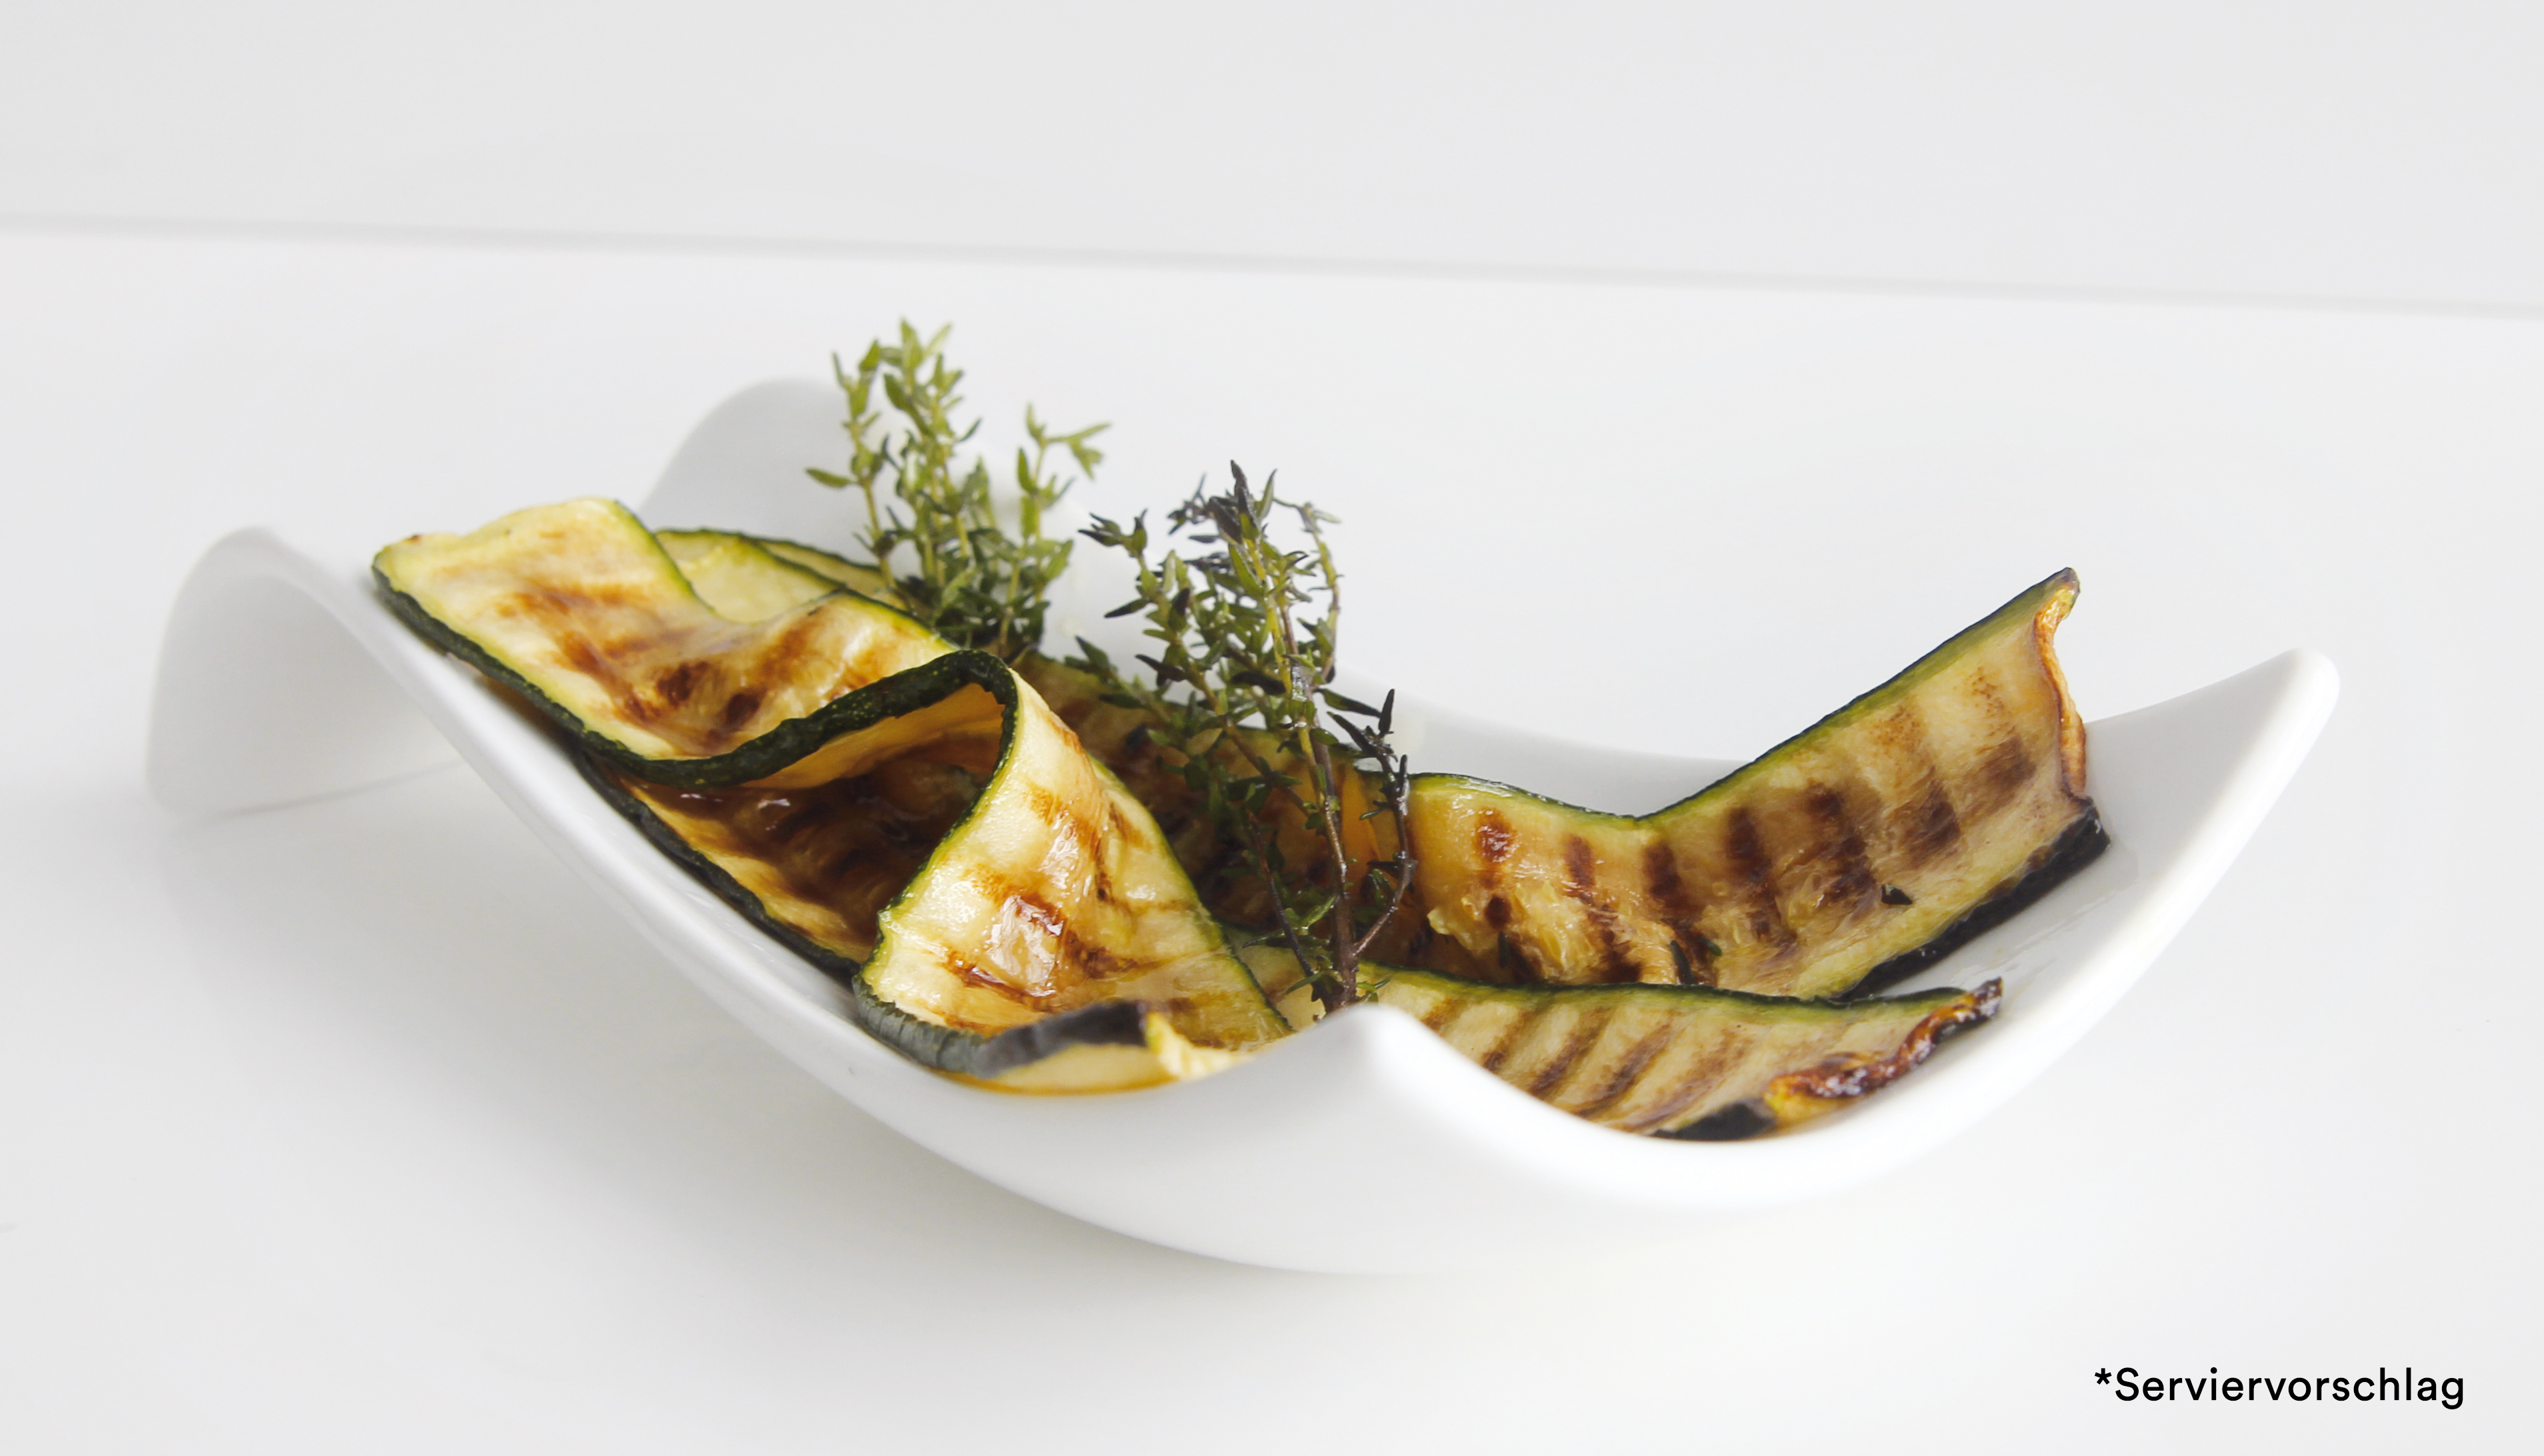 Gourmet gegrillte Zucchini